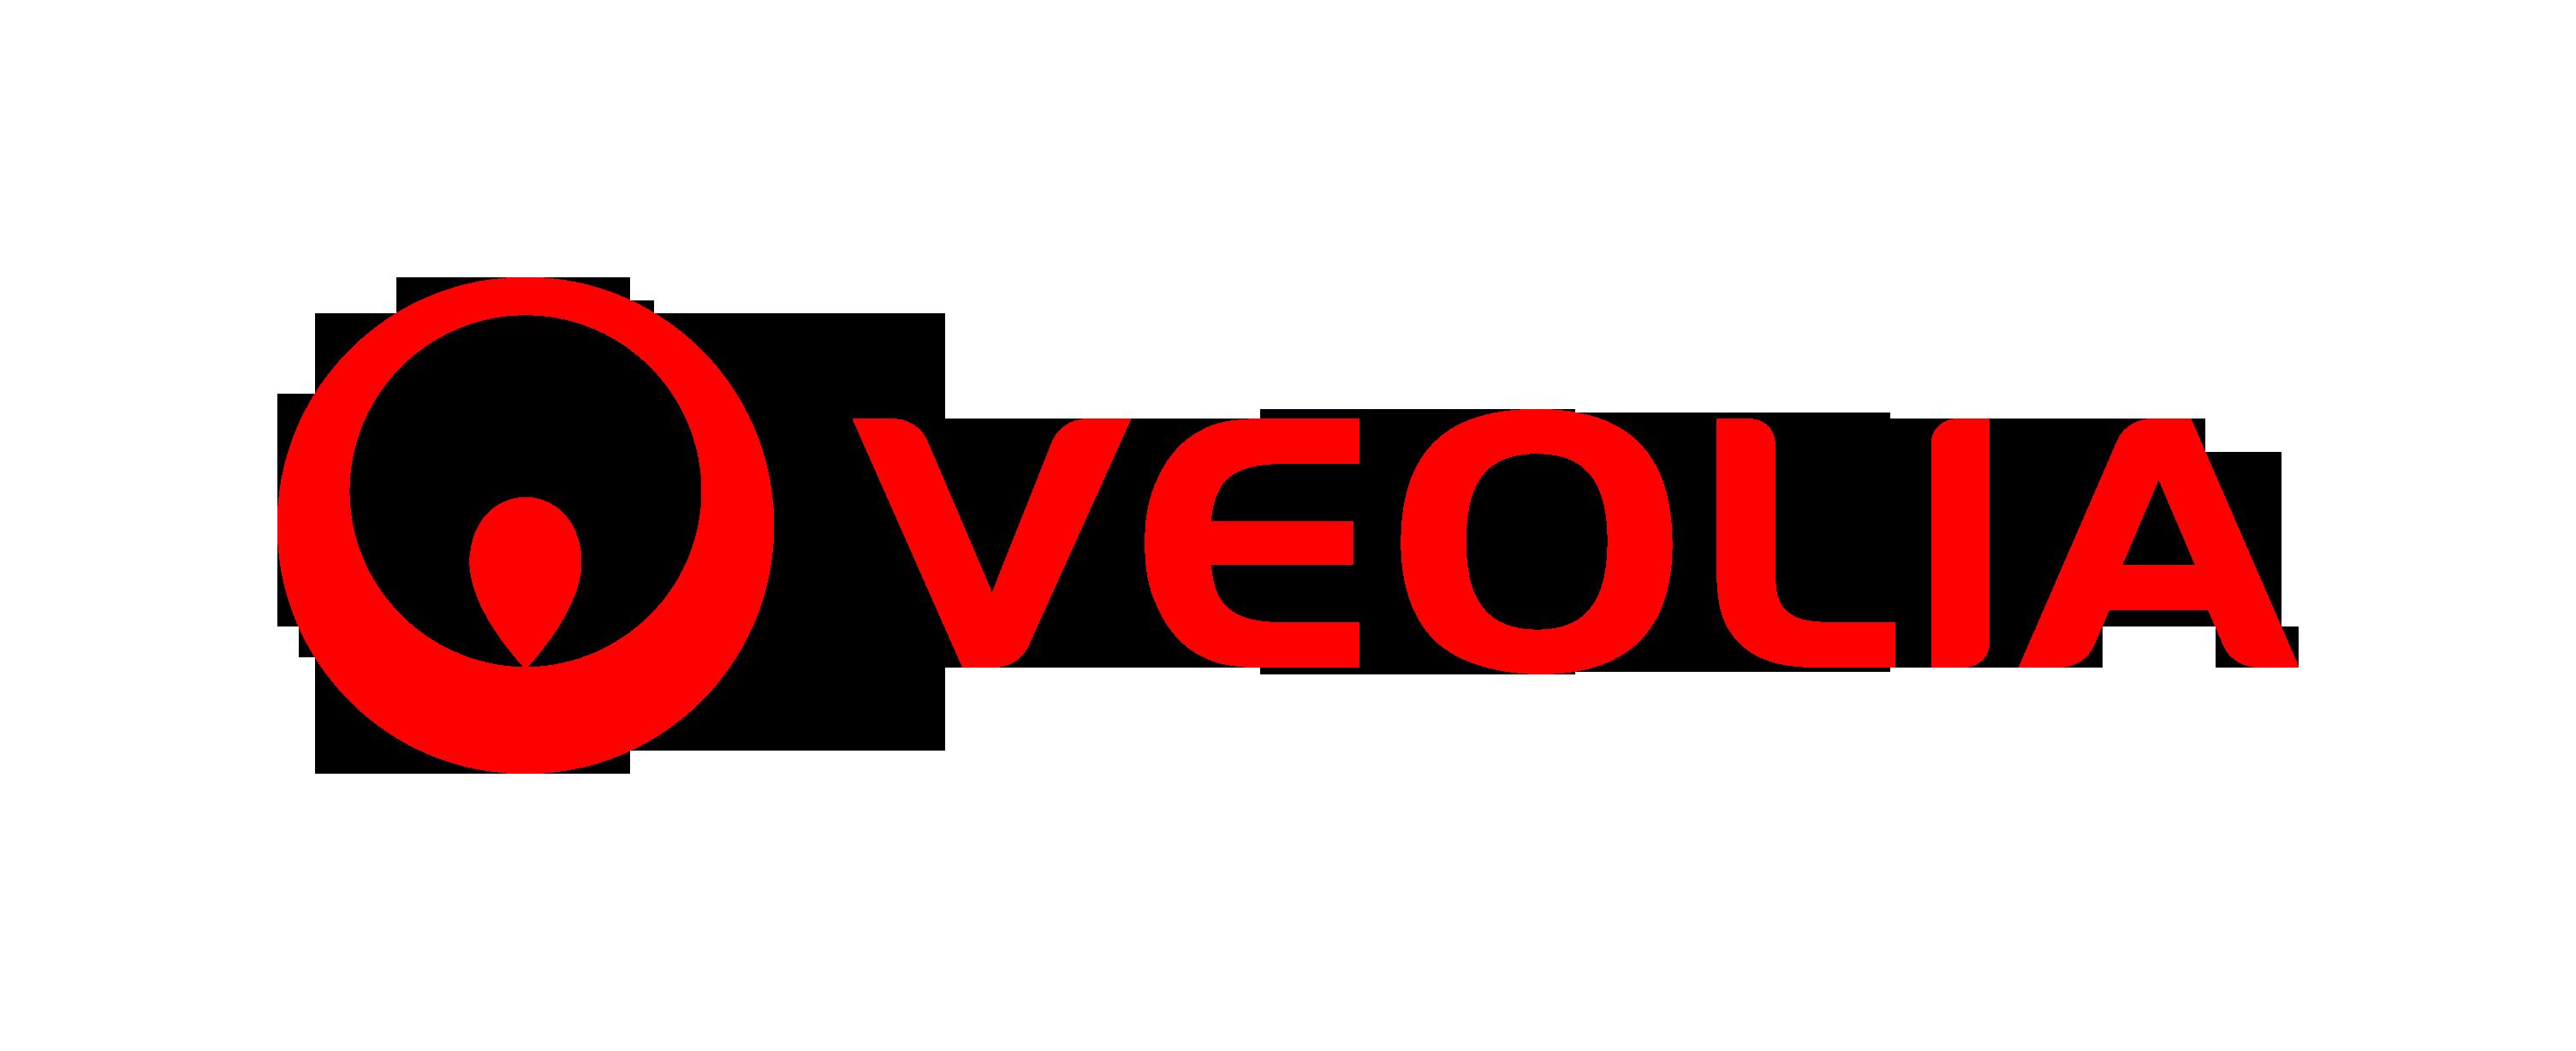 Veolia Water Technologies - John Meunier